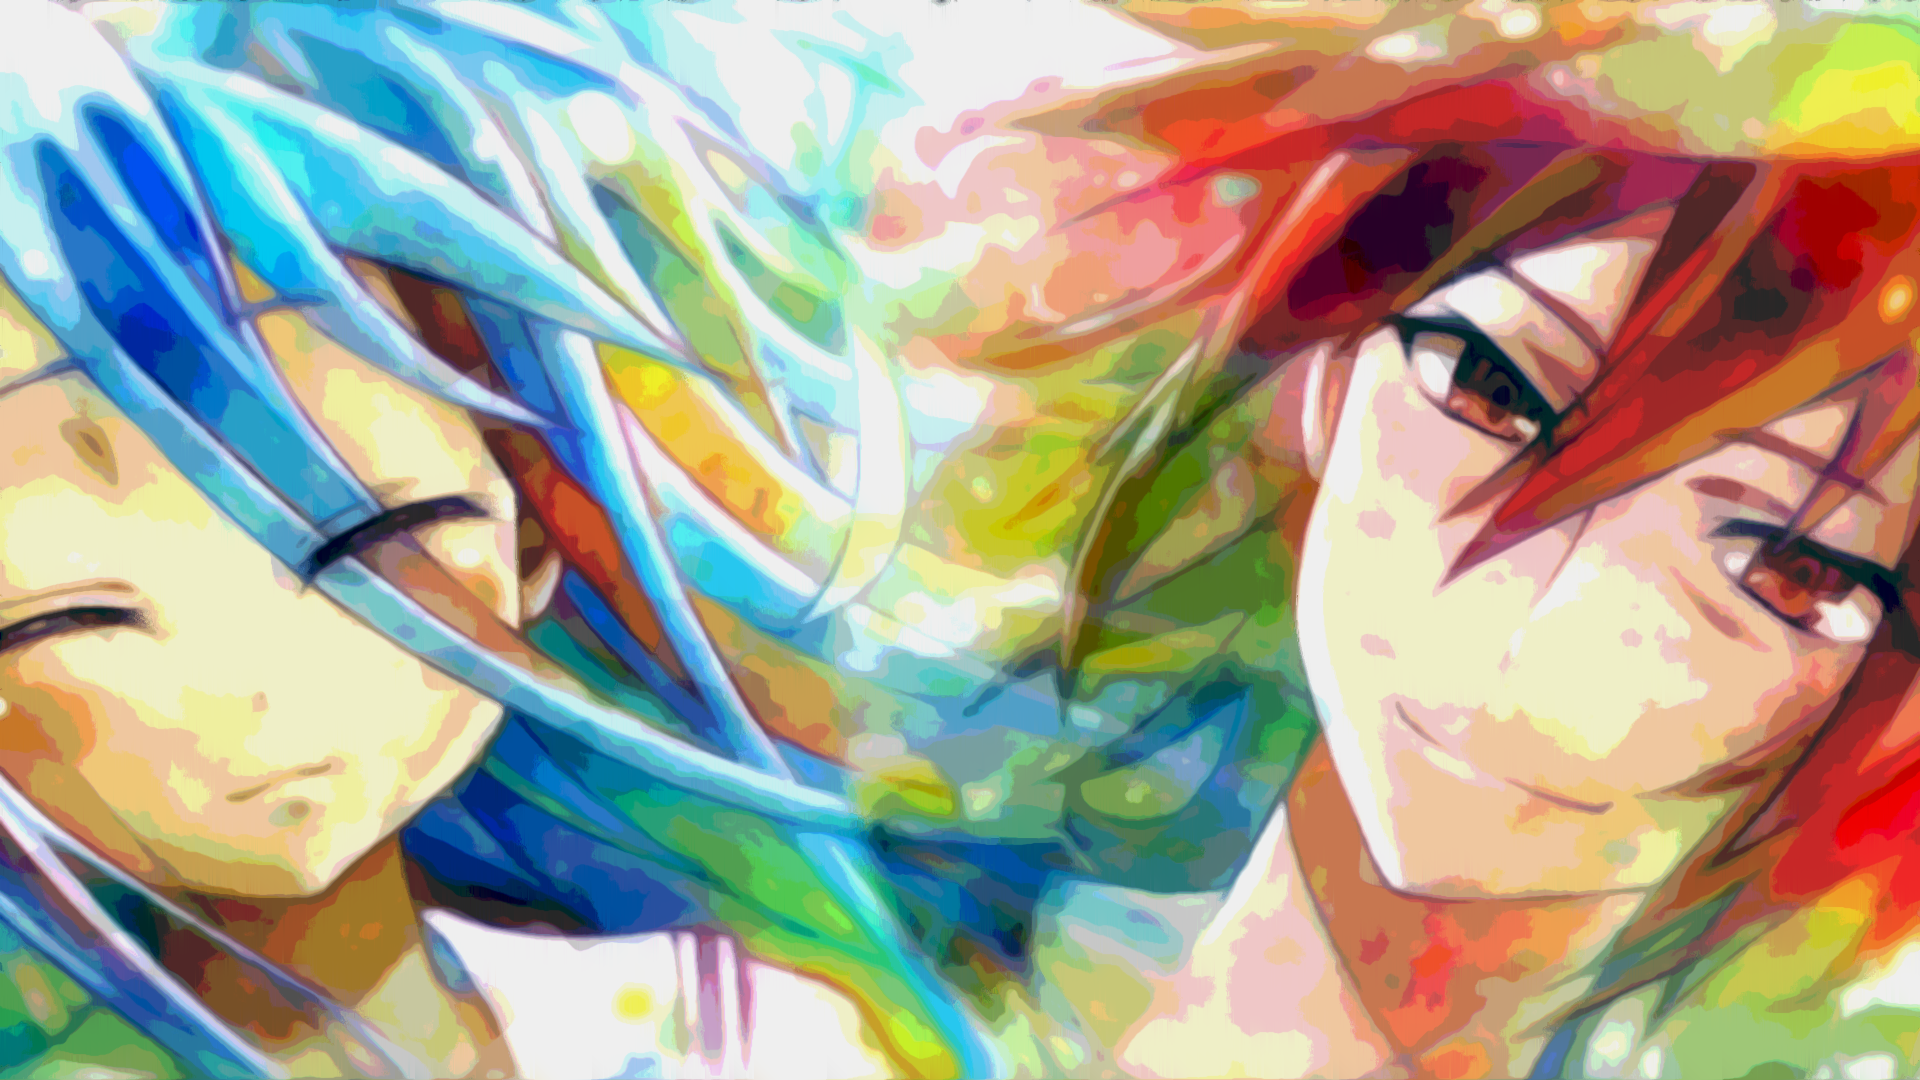 Anime No Game No Life Colorful Bright Anime Shiro No Game No Life Sora No Game No Life Wallpaper Anime No Game No Life Happy Tree Friends